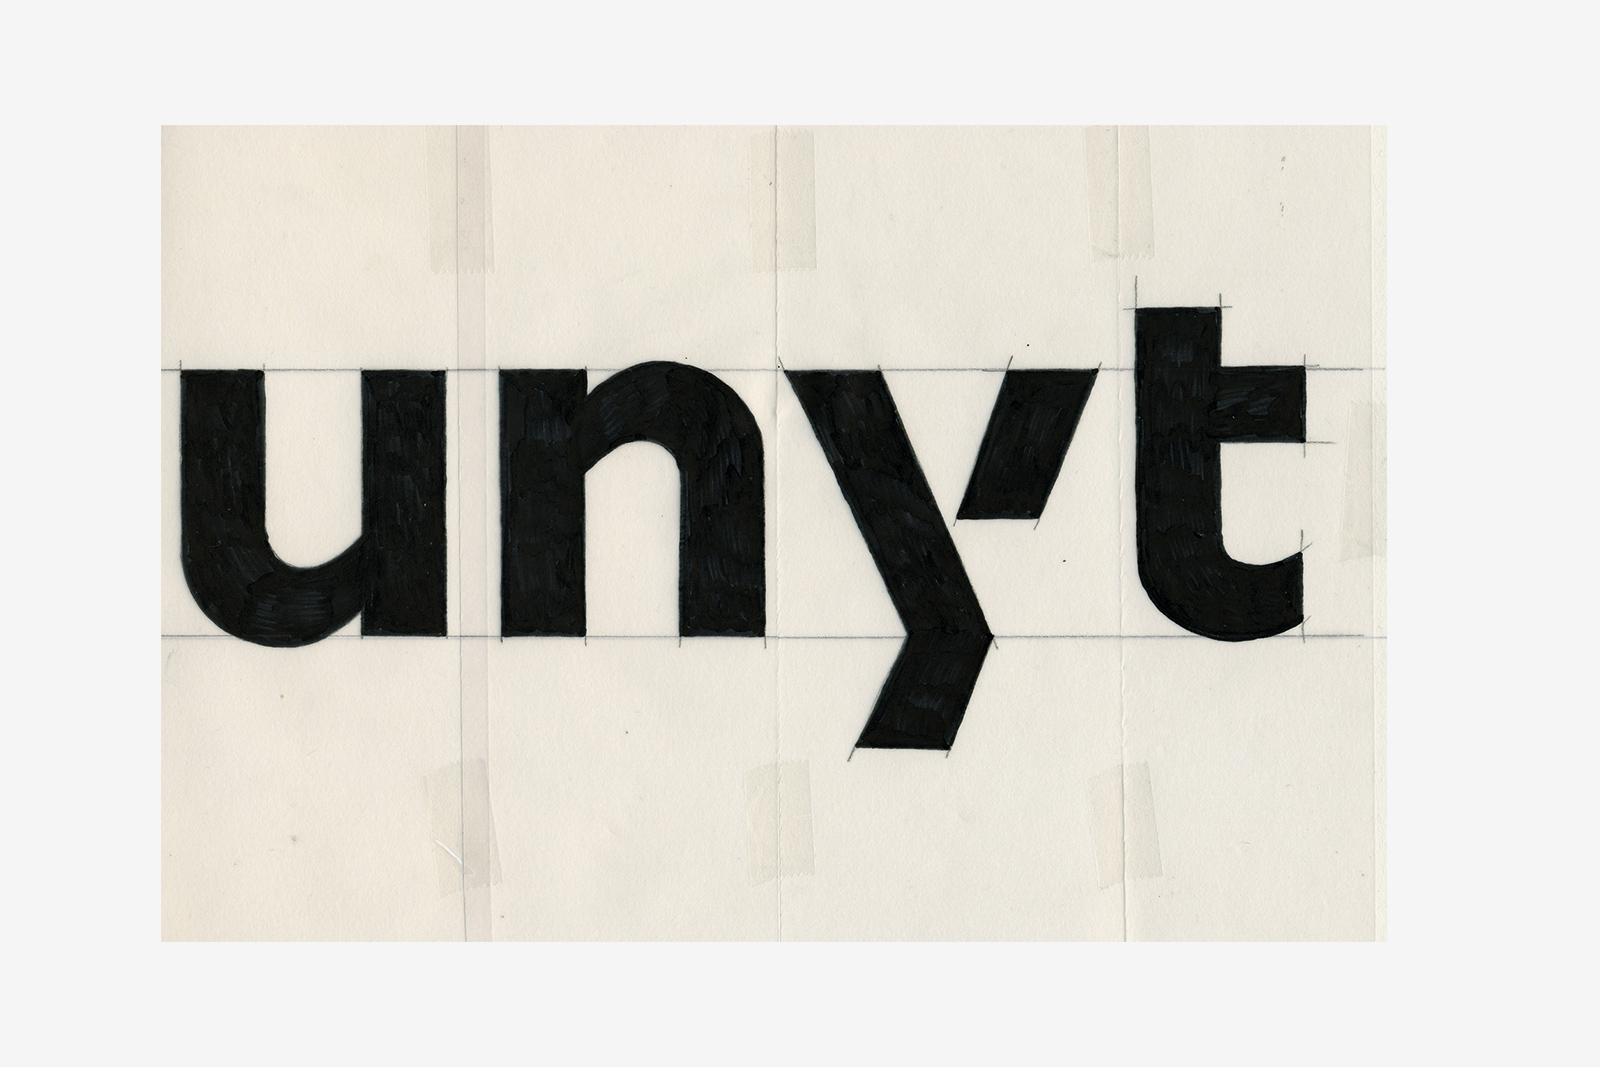 unyt-logo-letter-buero-ink